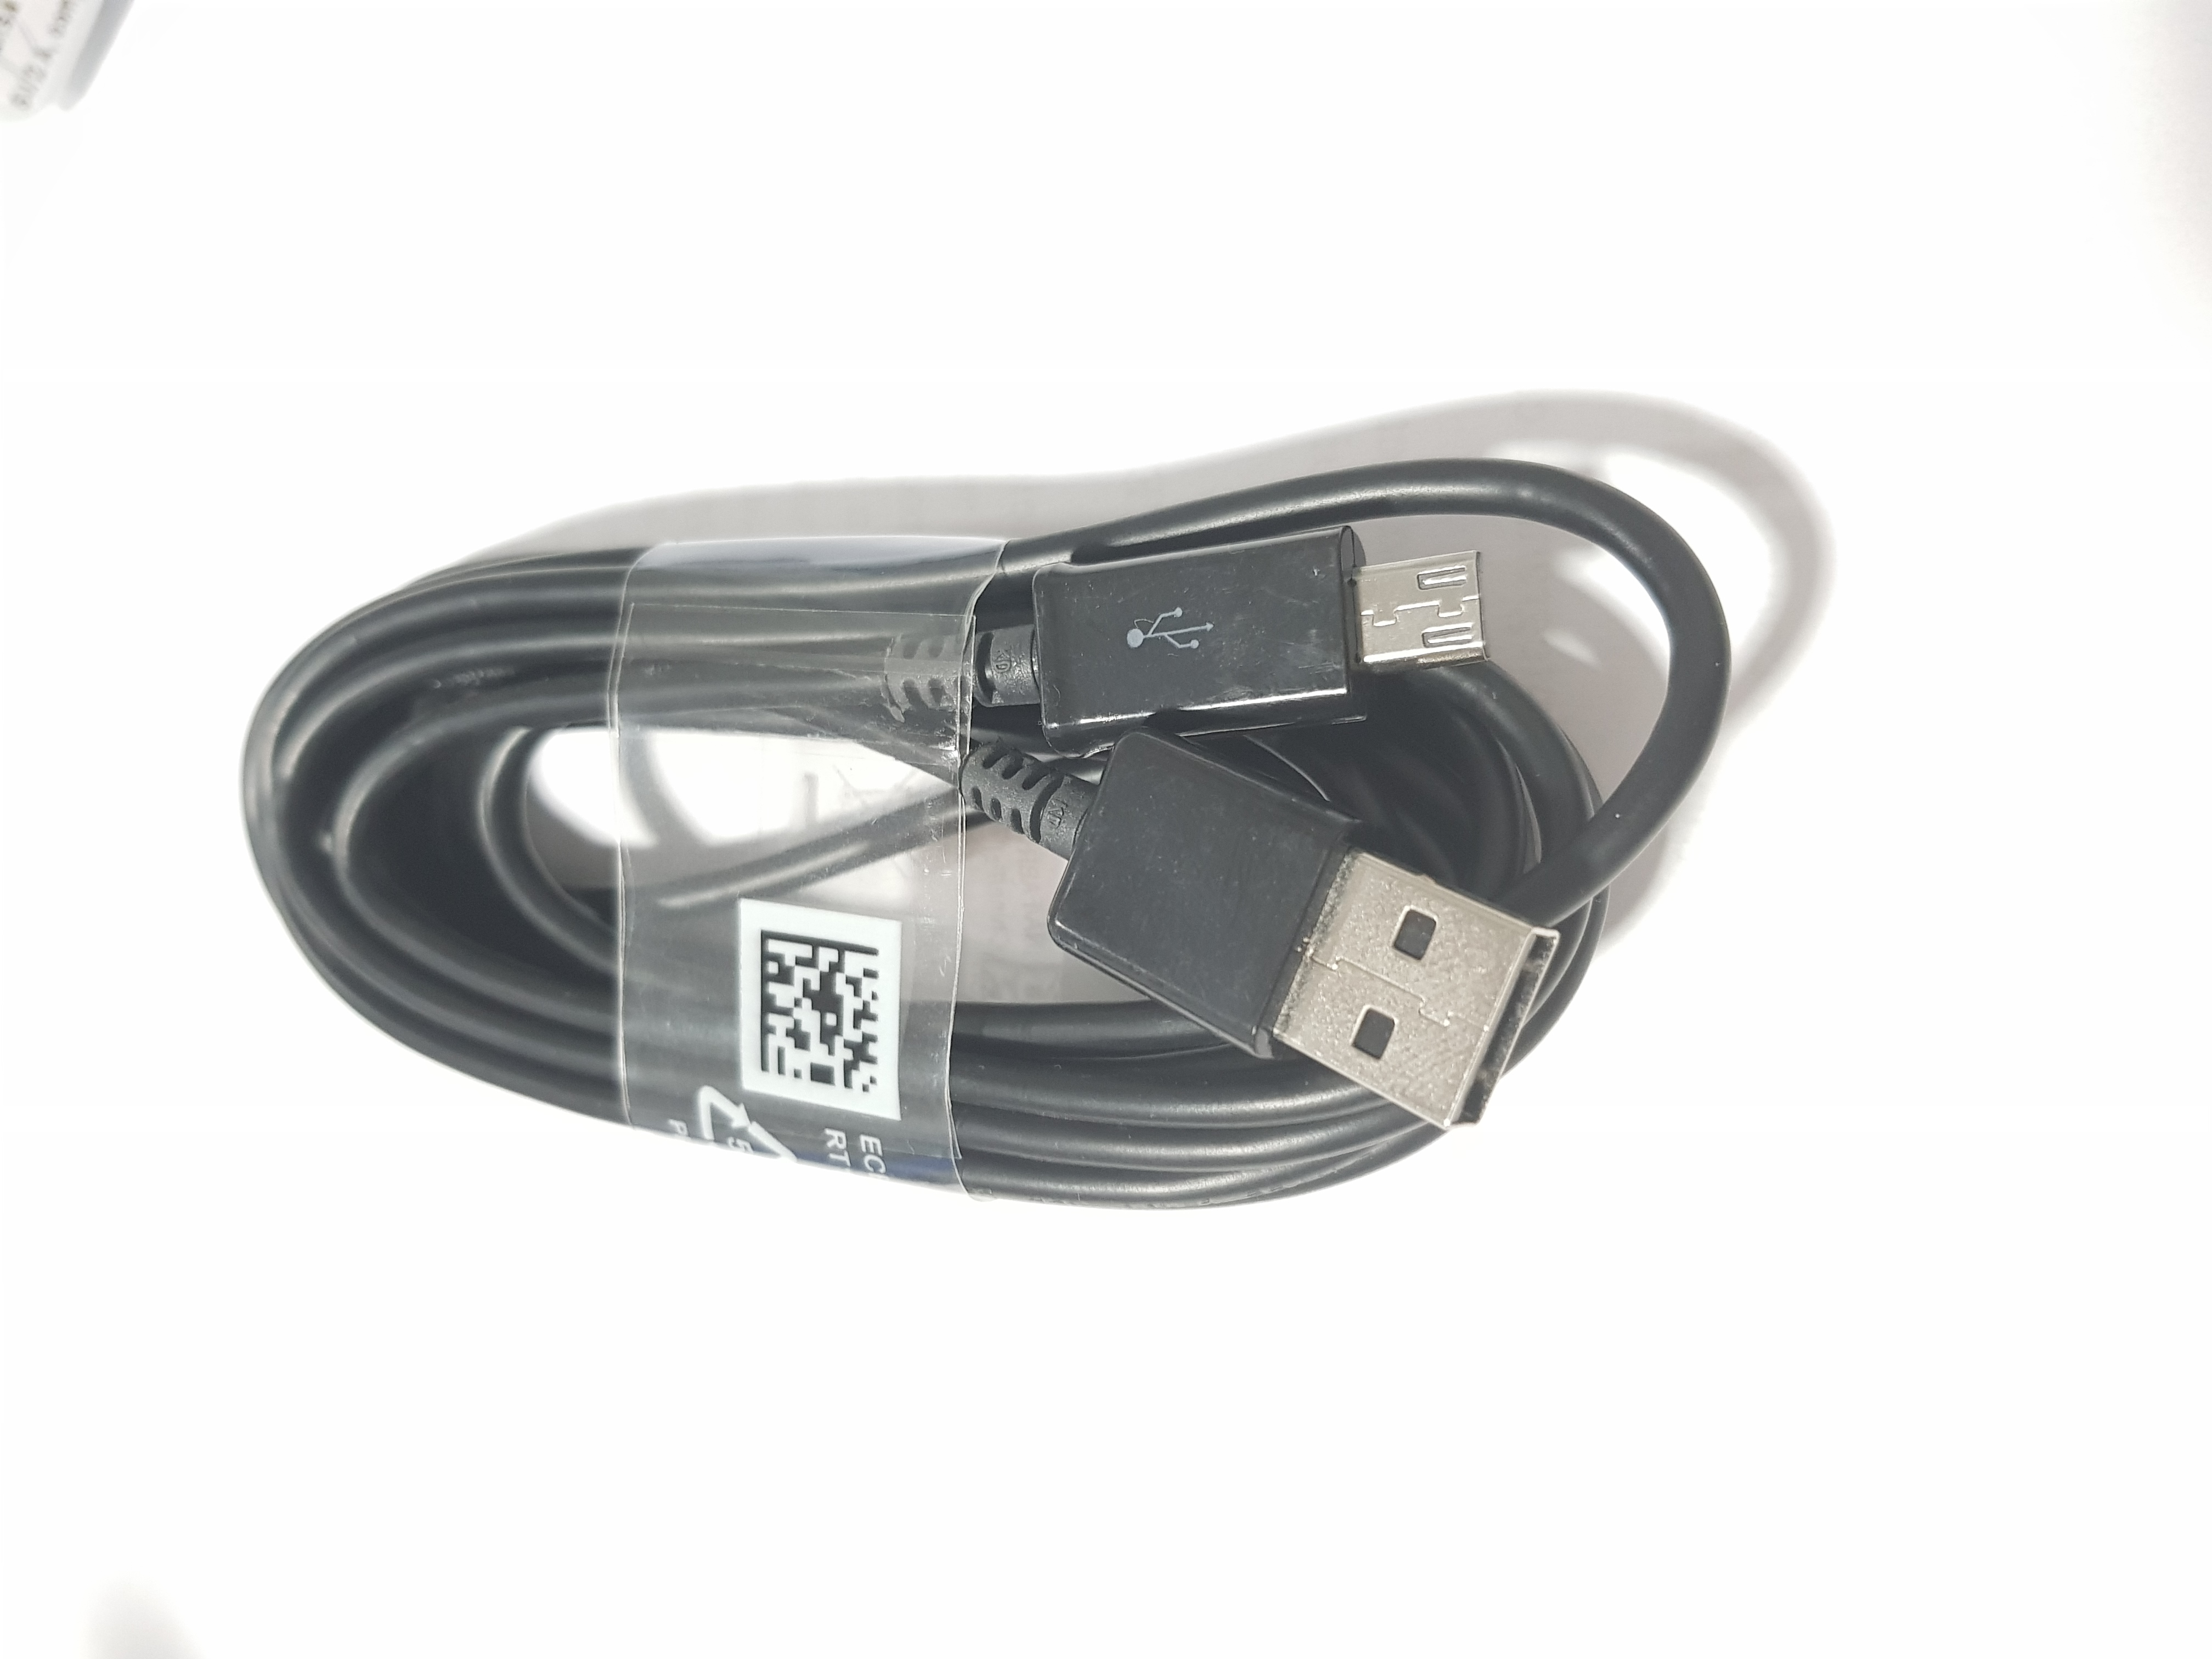 Cablu micro usb 3 metri universal conector lung Negru [0]